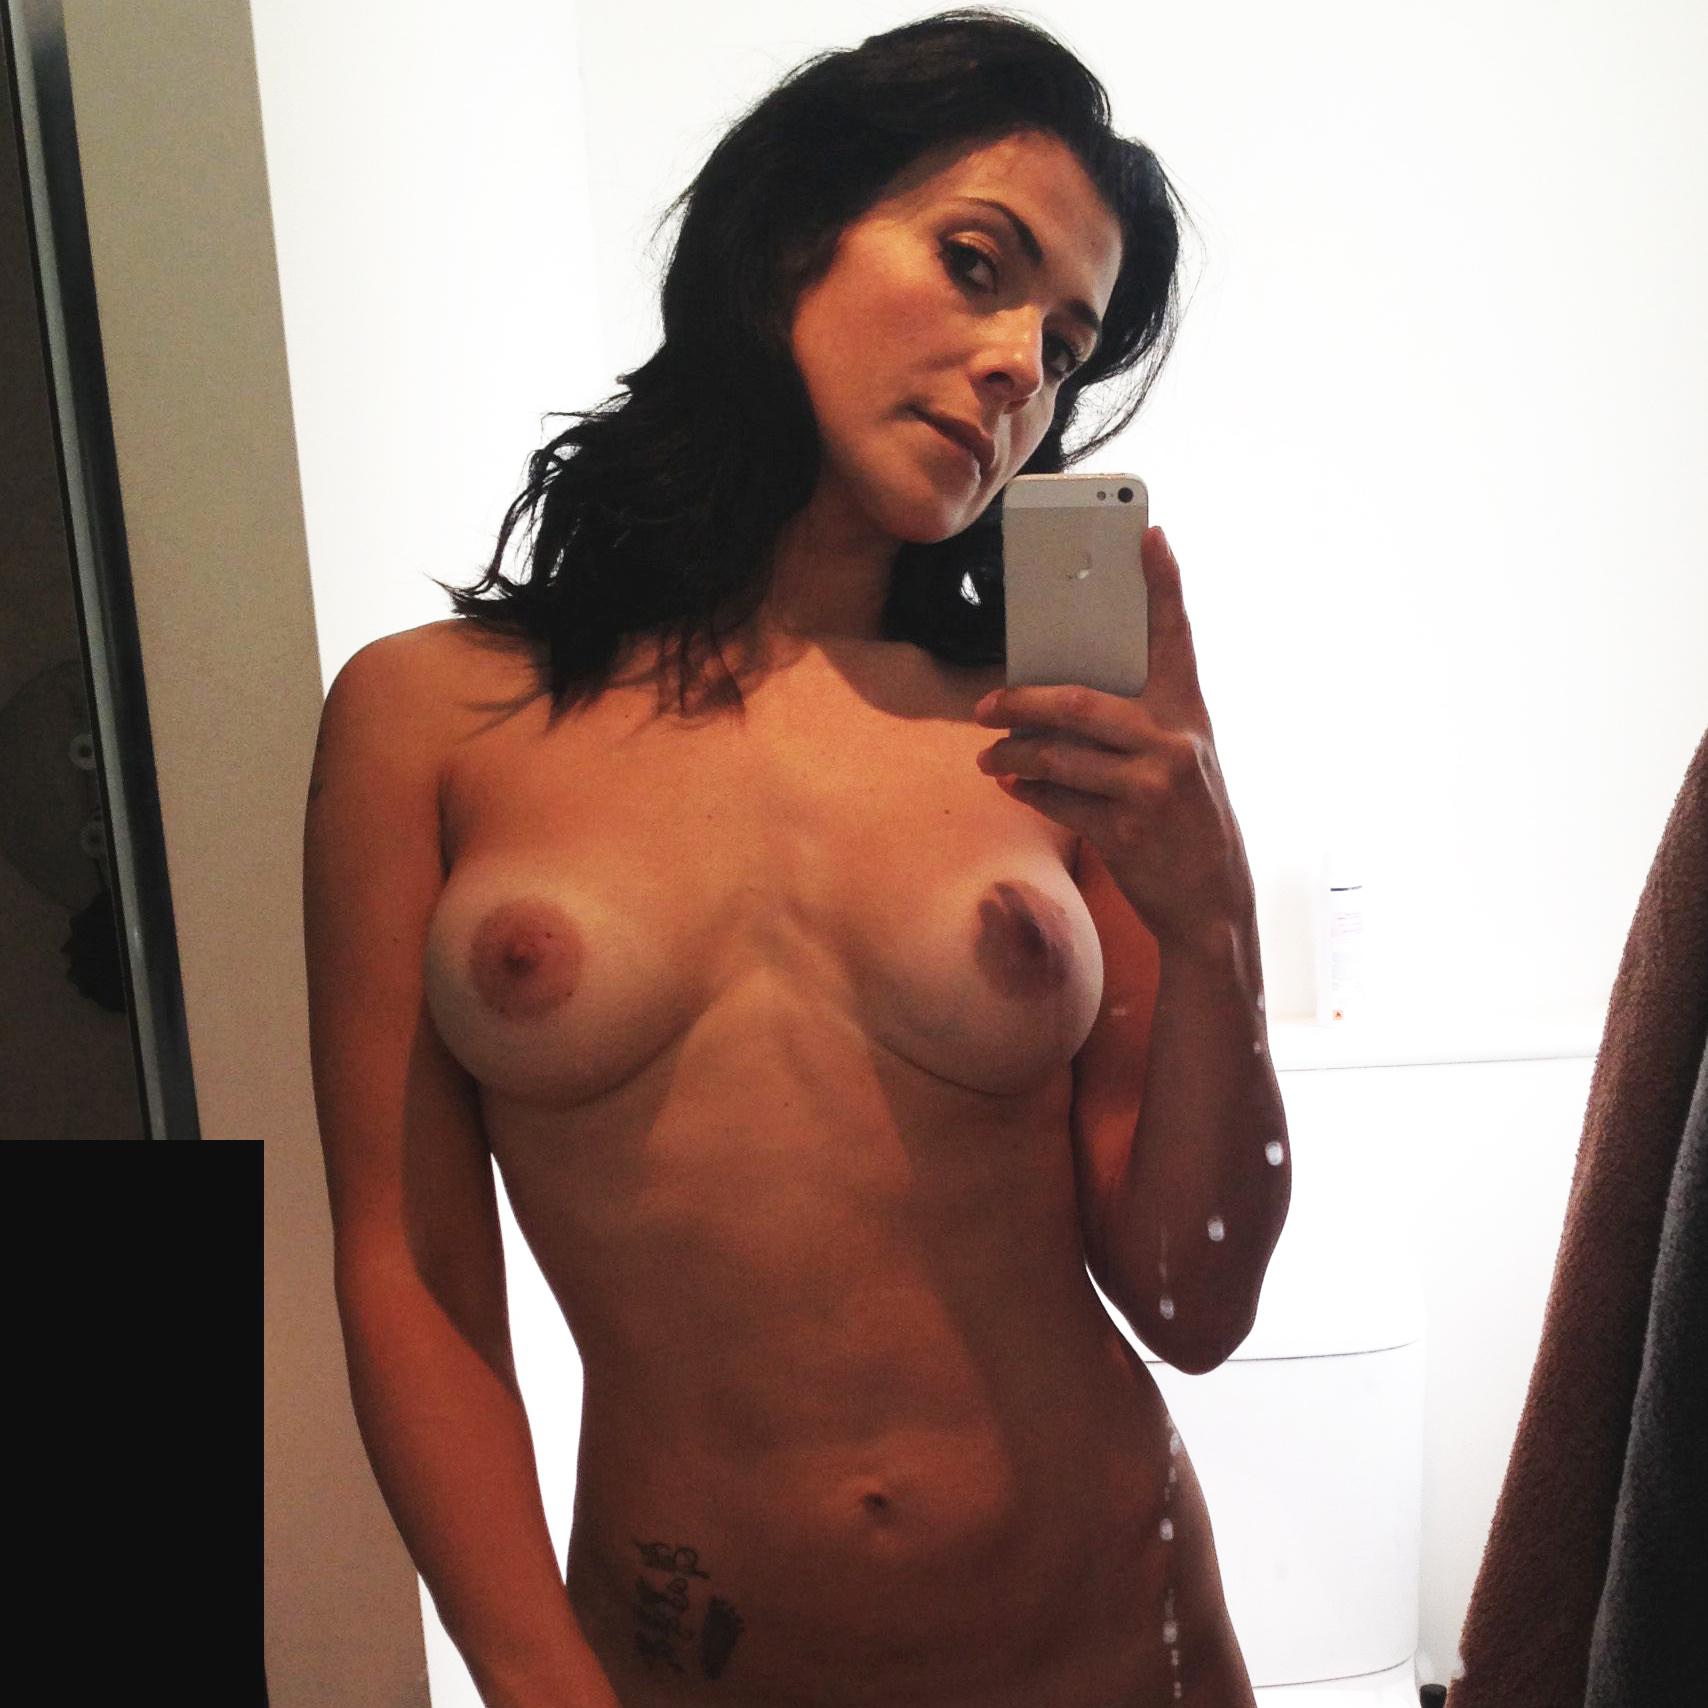 Kym Marsh Nude LEAKED Pics & Blowjob Porn Video